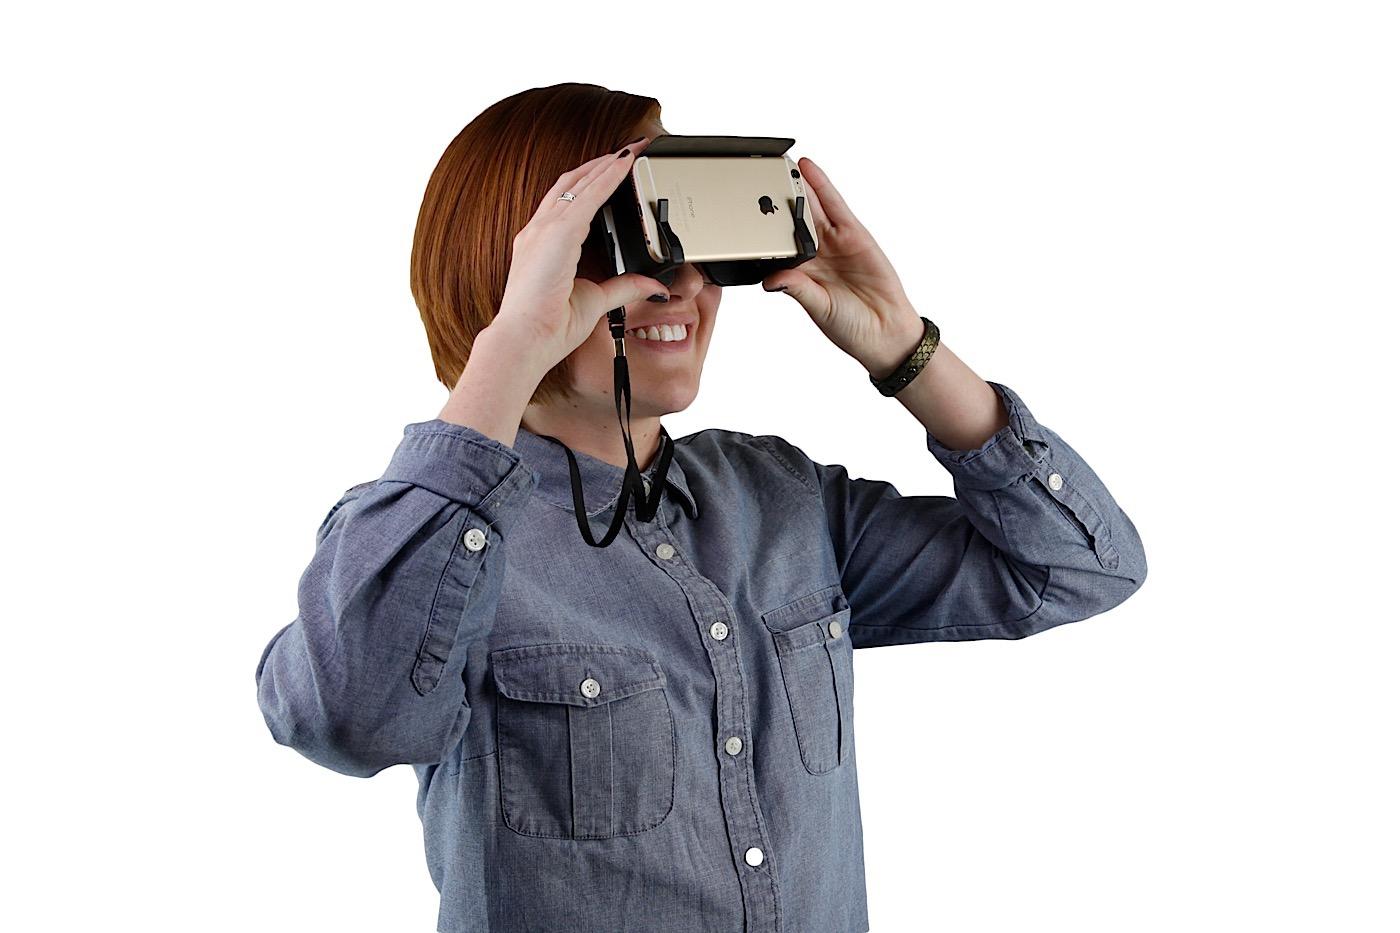 Dodocase's SmartVR is a pocket-sized Cardboard alternative